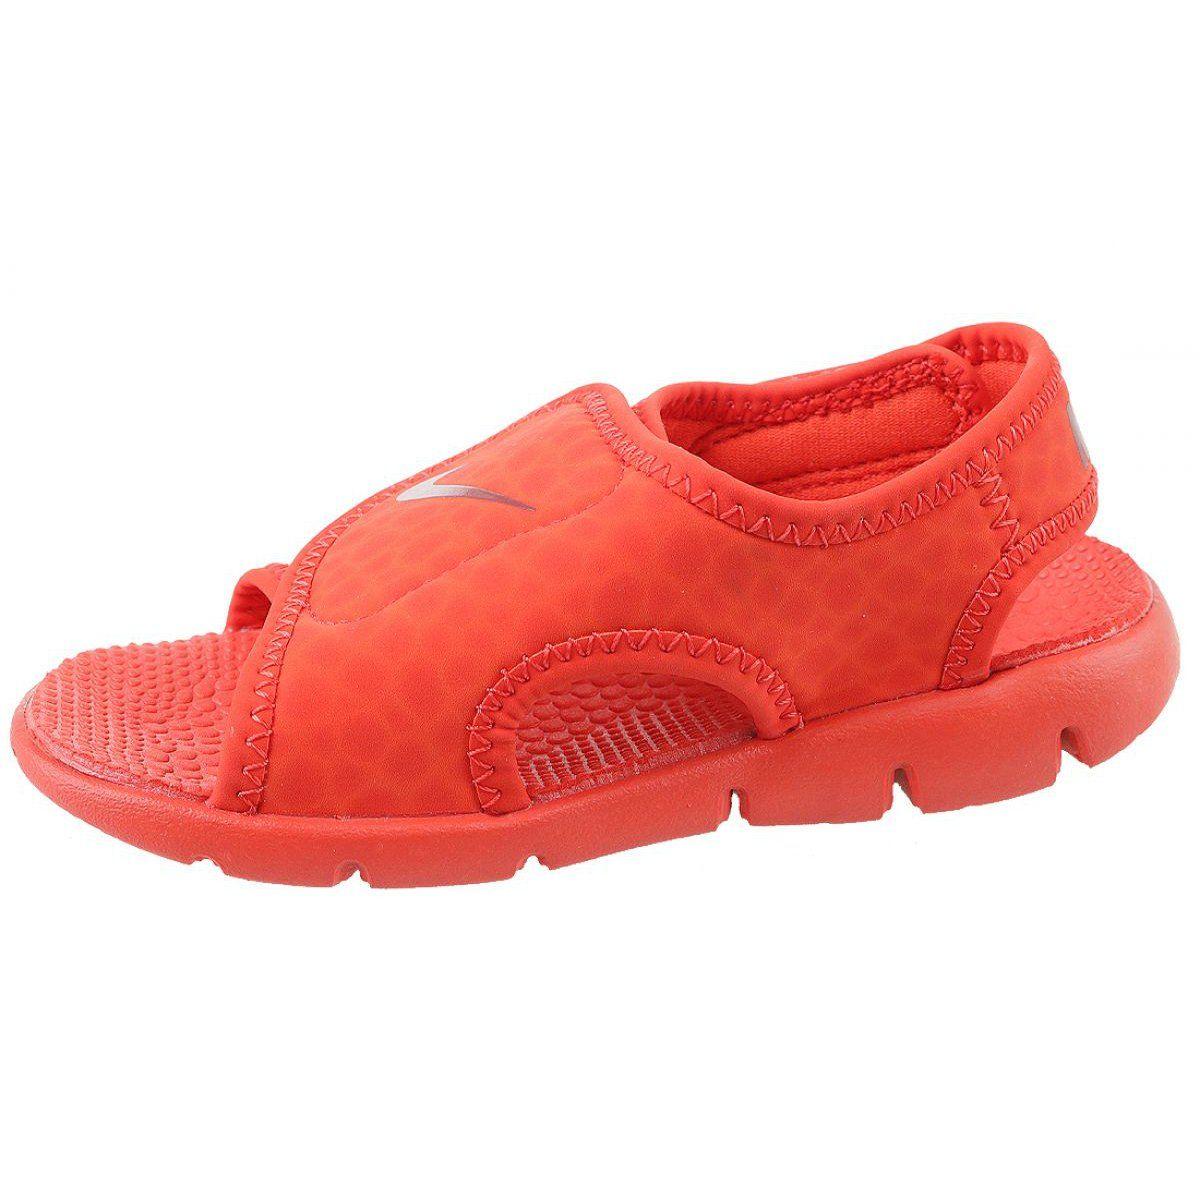 Sandaly Nike Sunray Adjust 4 Ps Jr 386518 603 Czerwone Kid Shoes Nike Shoes Perfect Shoes